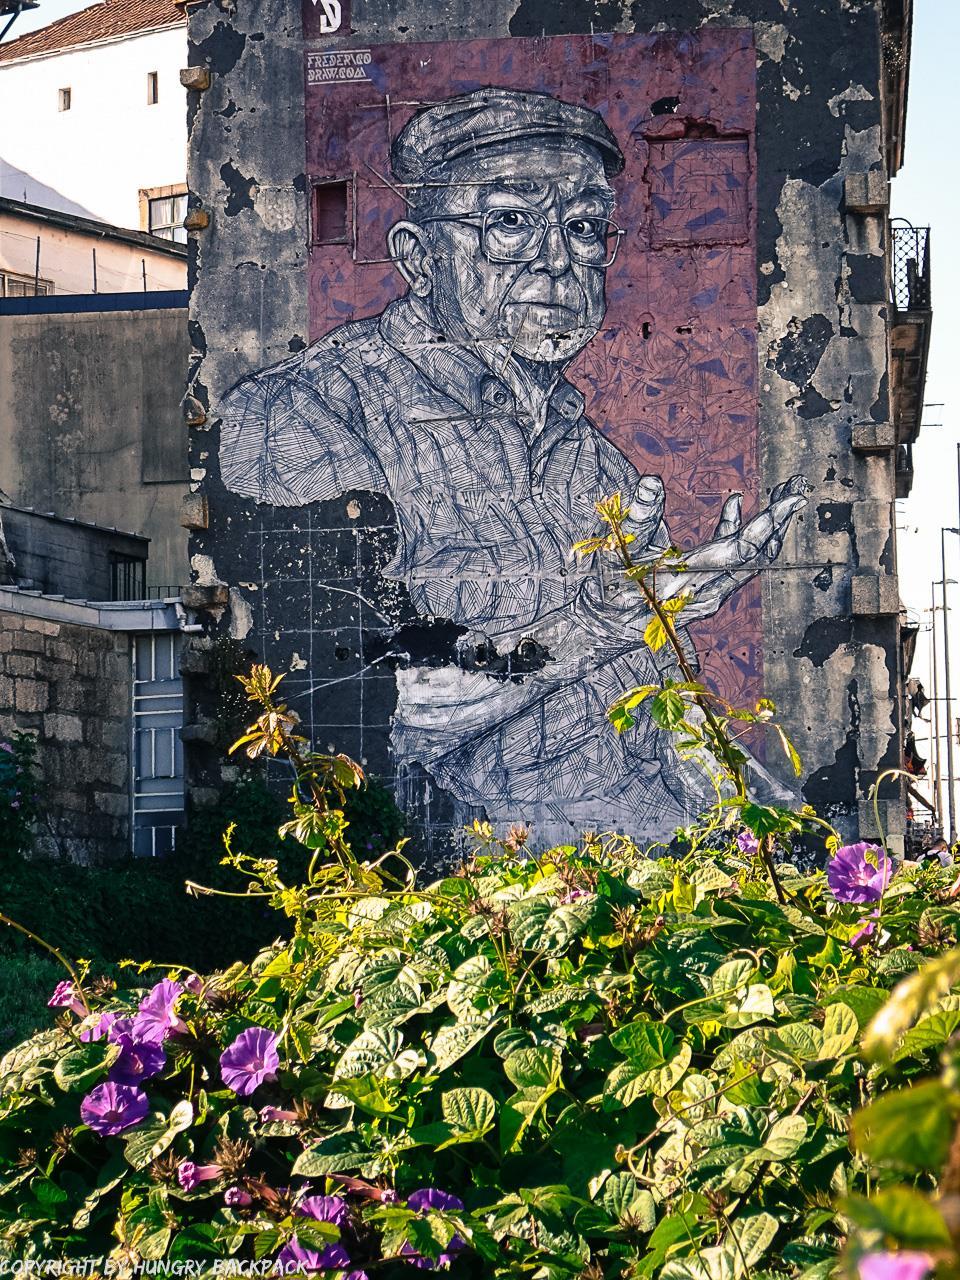 Porto street art_AN.FI.TRI.ÃO by Frederico Draw close